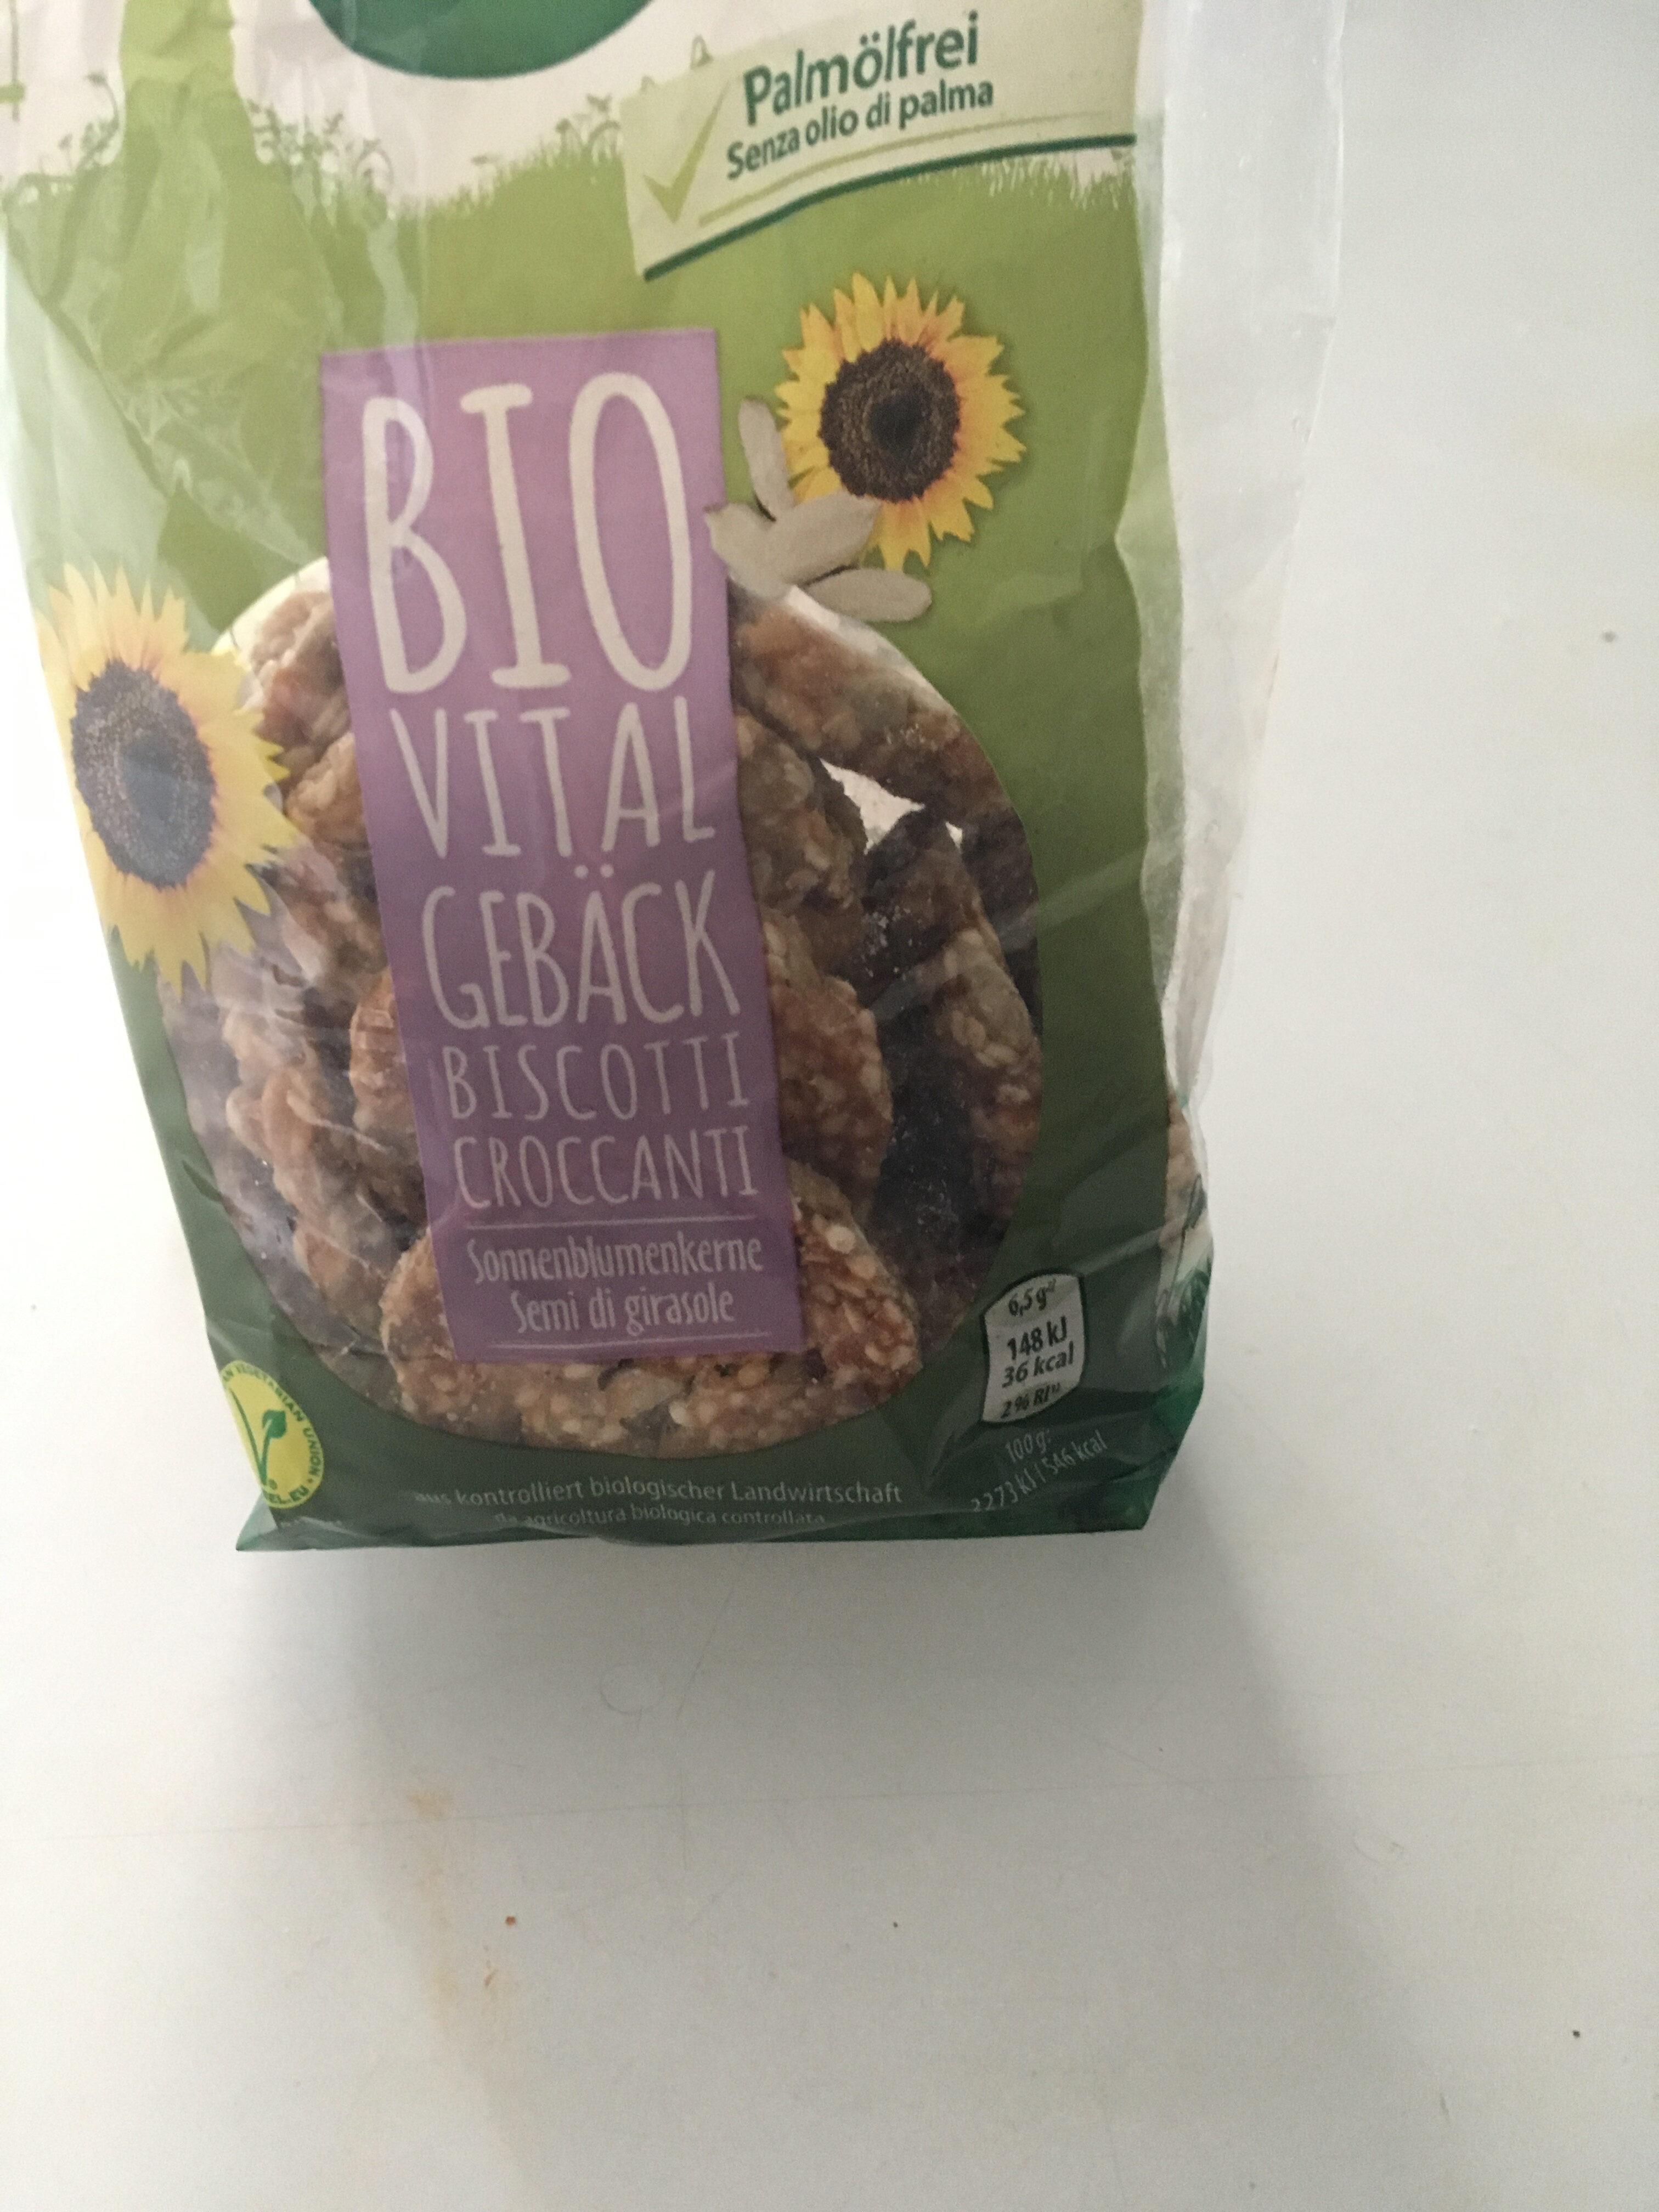 Bio. Vital Gebäck - Product